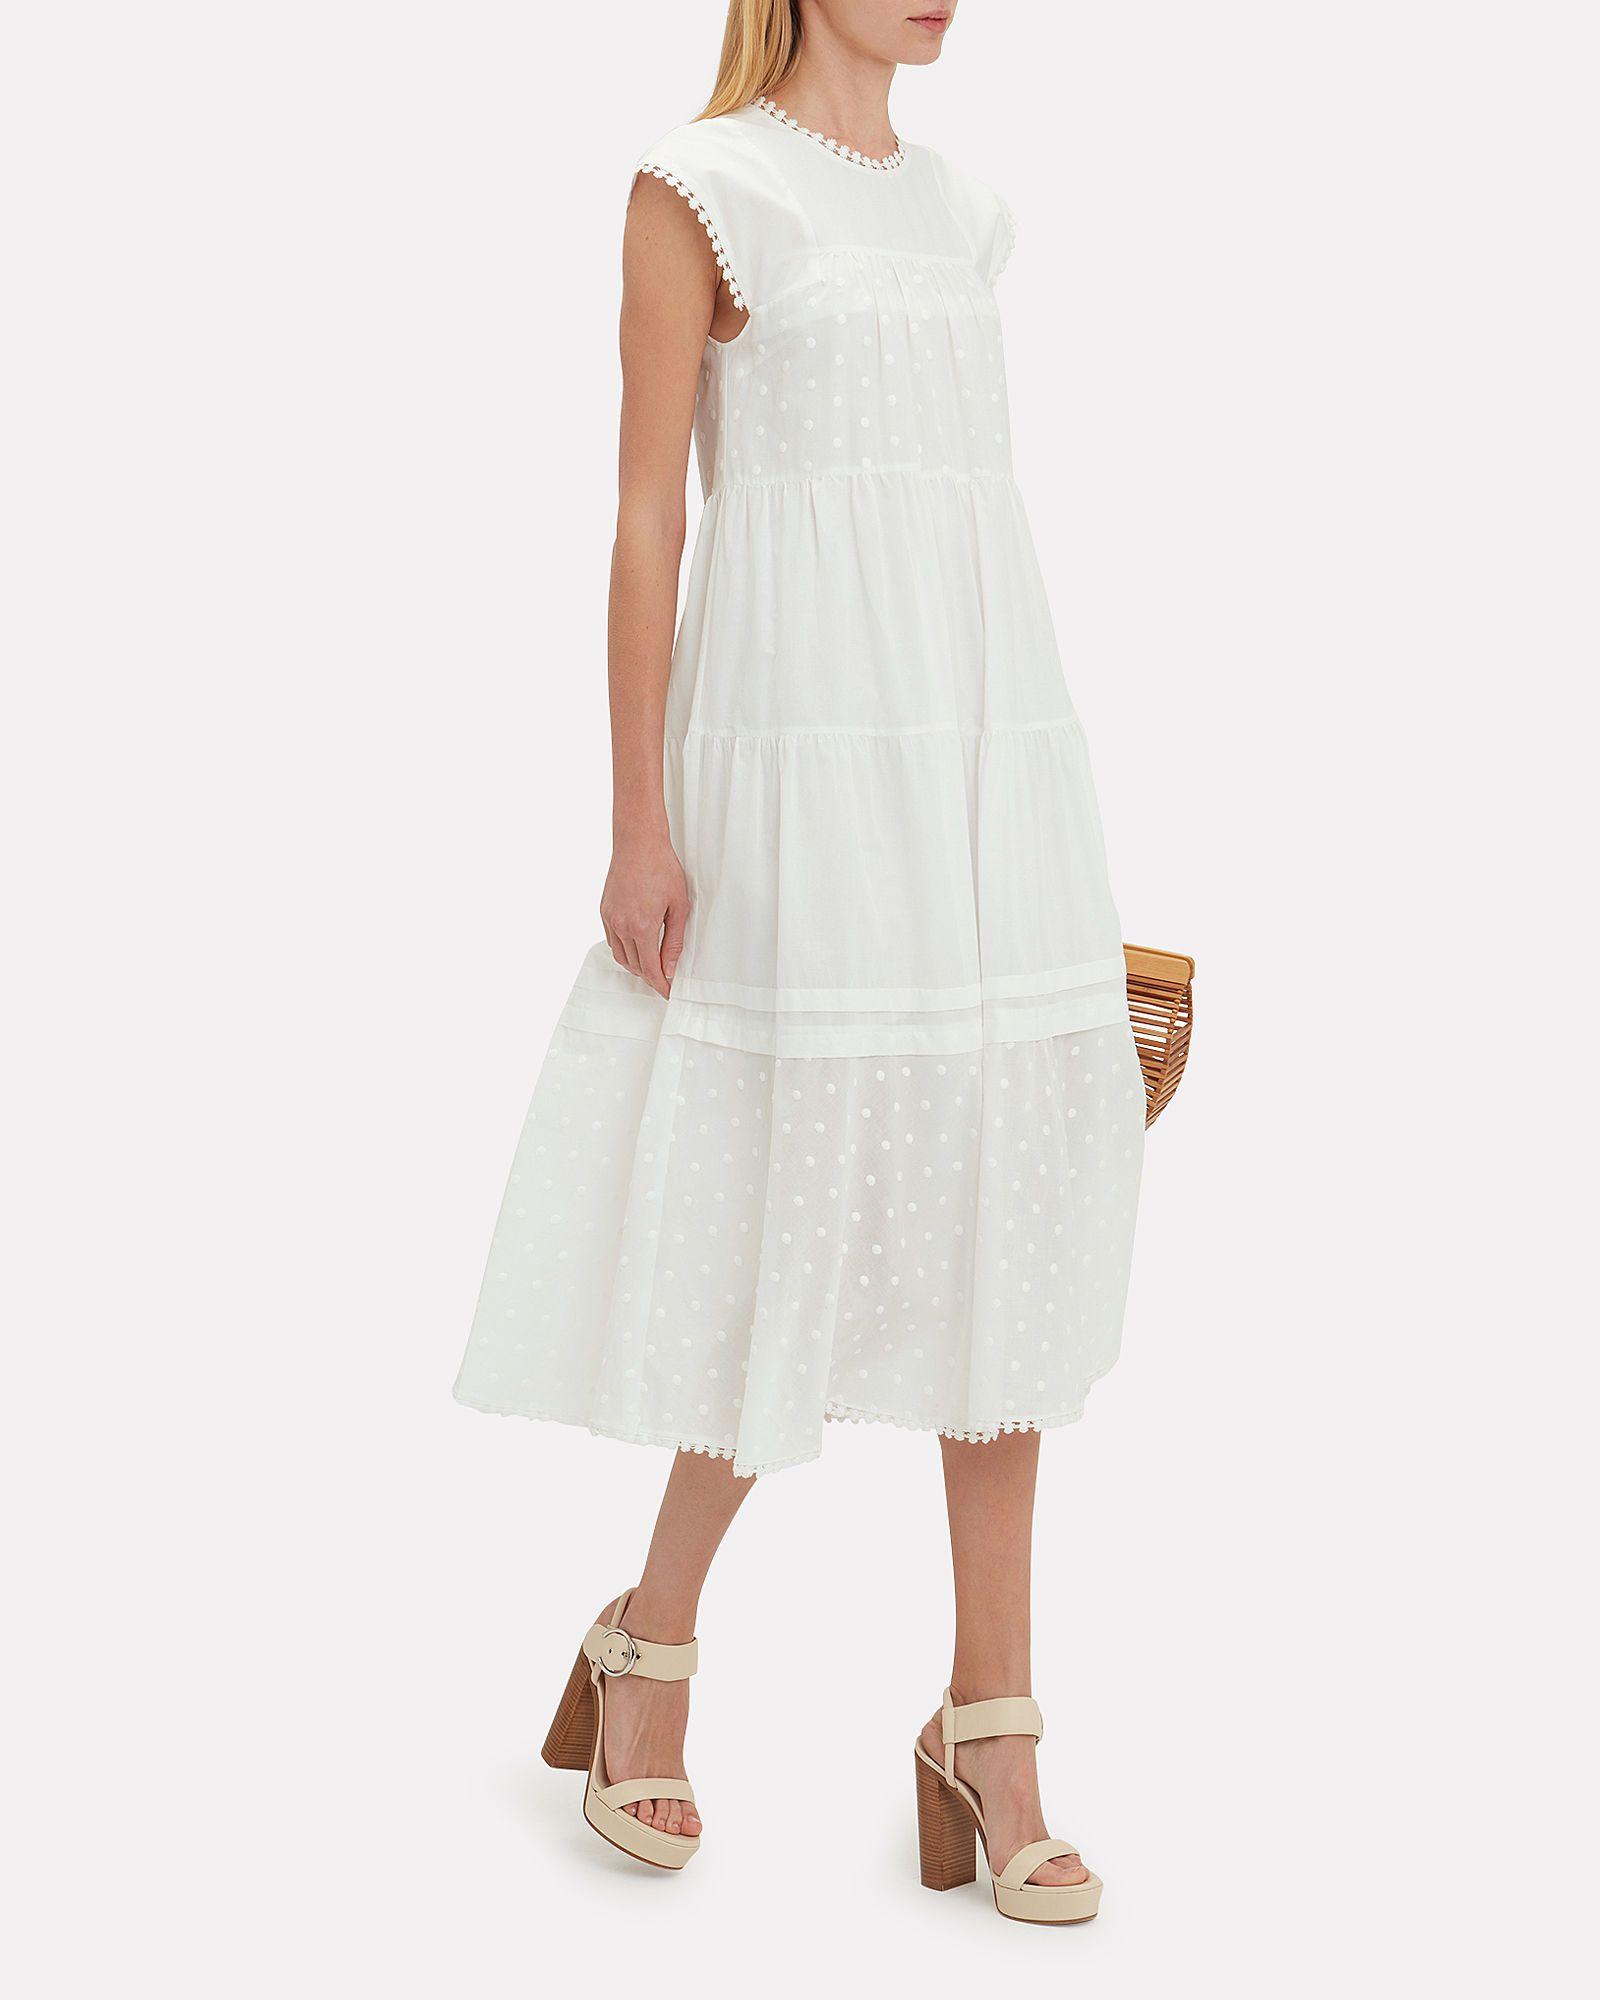 Swiss Dot Cotton Maxi Dress Maxi Dress Cotton Cotton Maxi Maxi Dress [ 2000 x 1600 Pixel ]